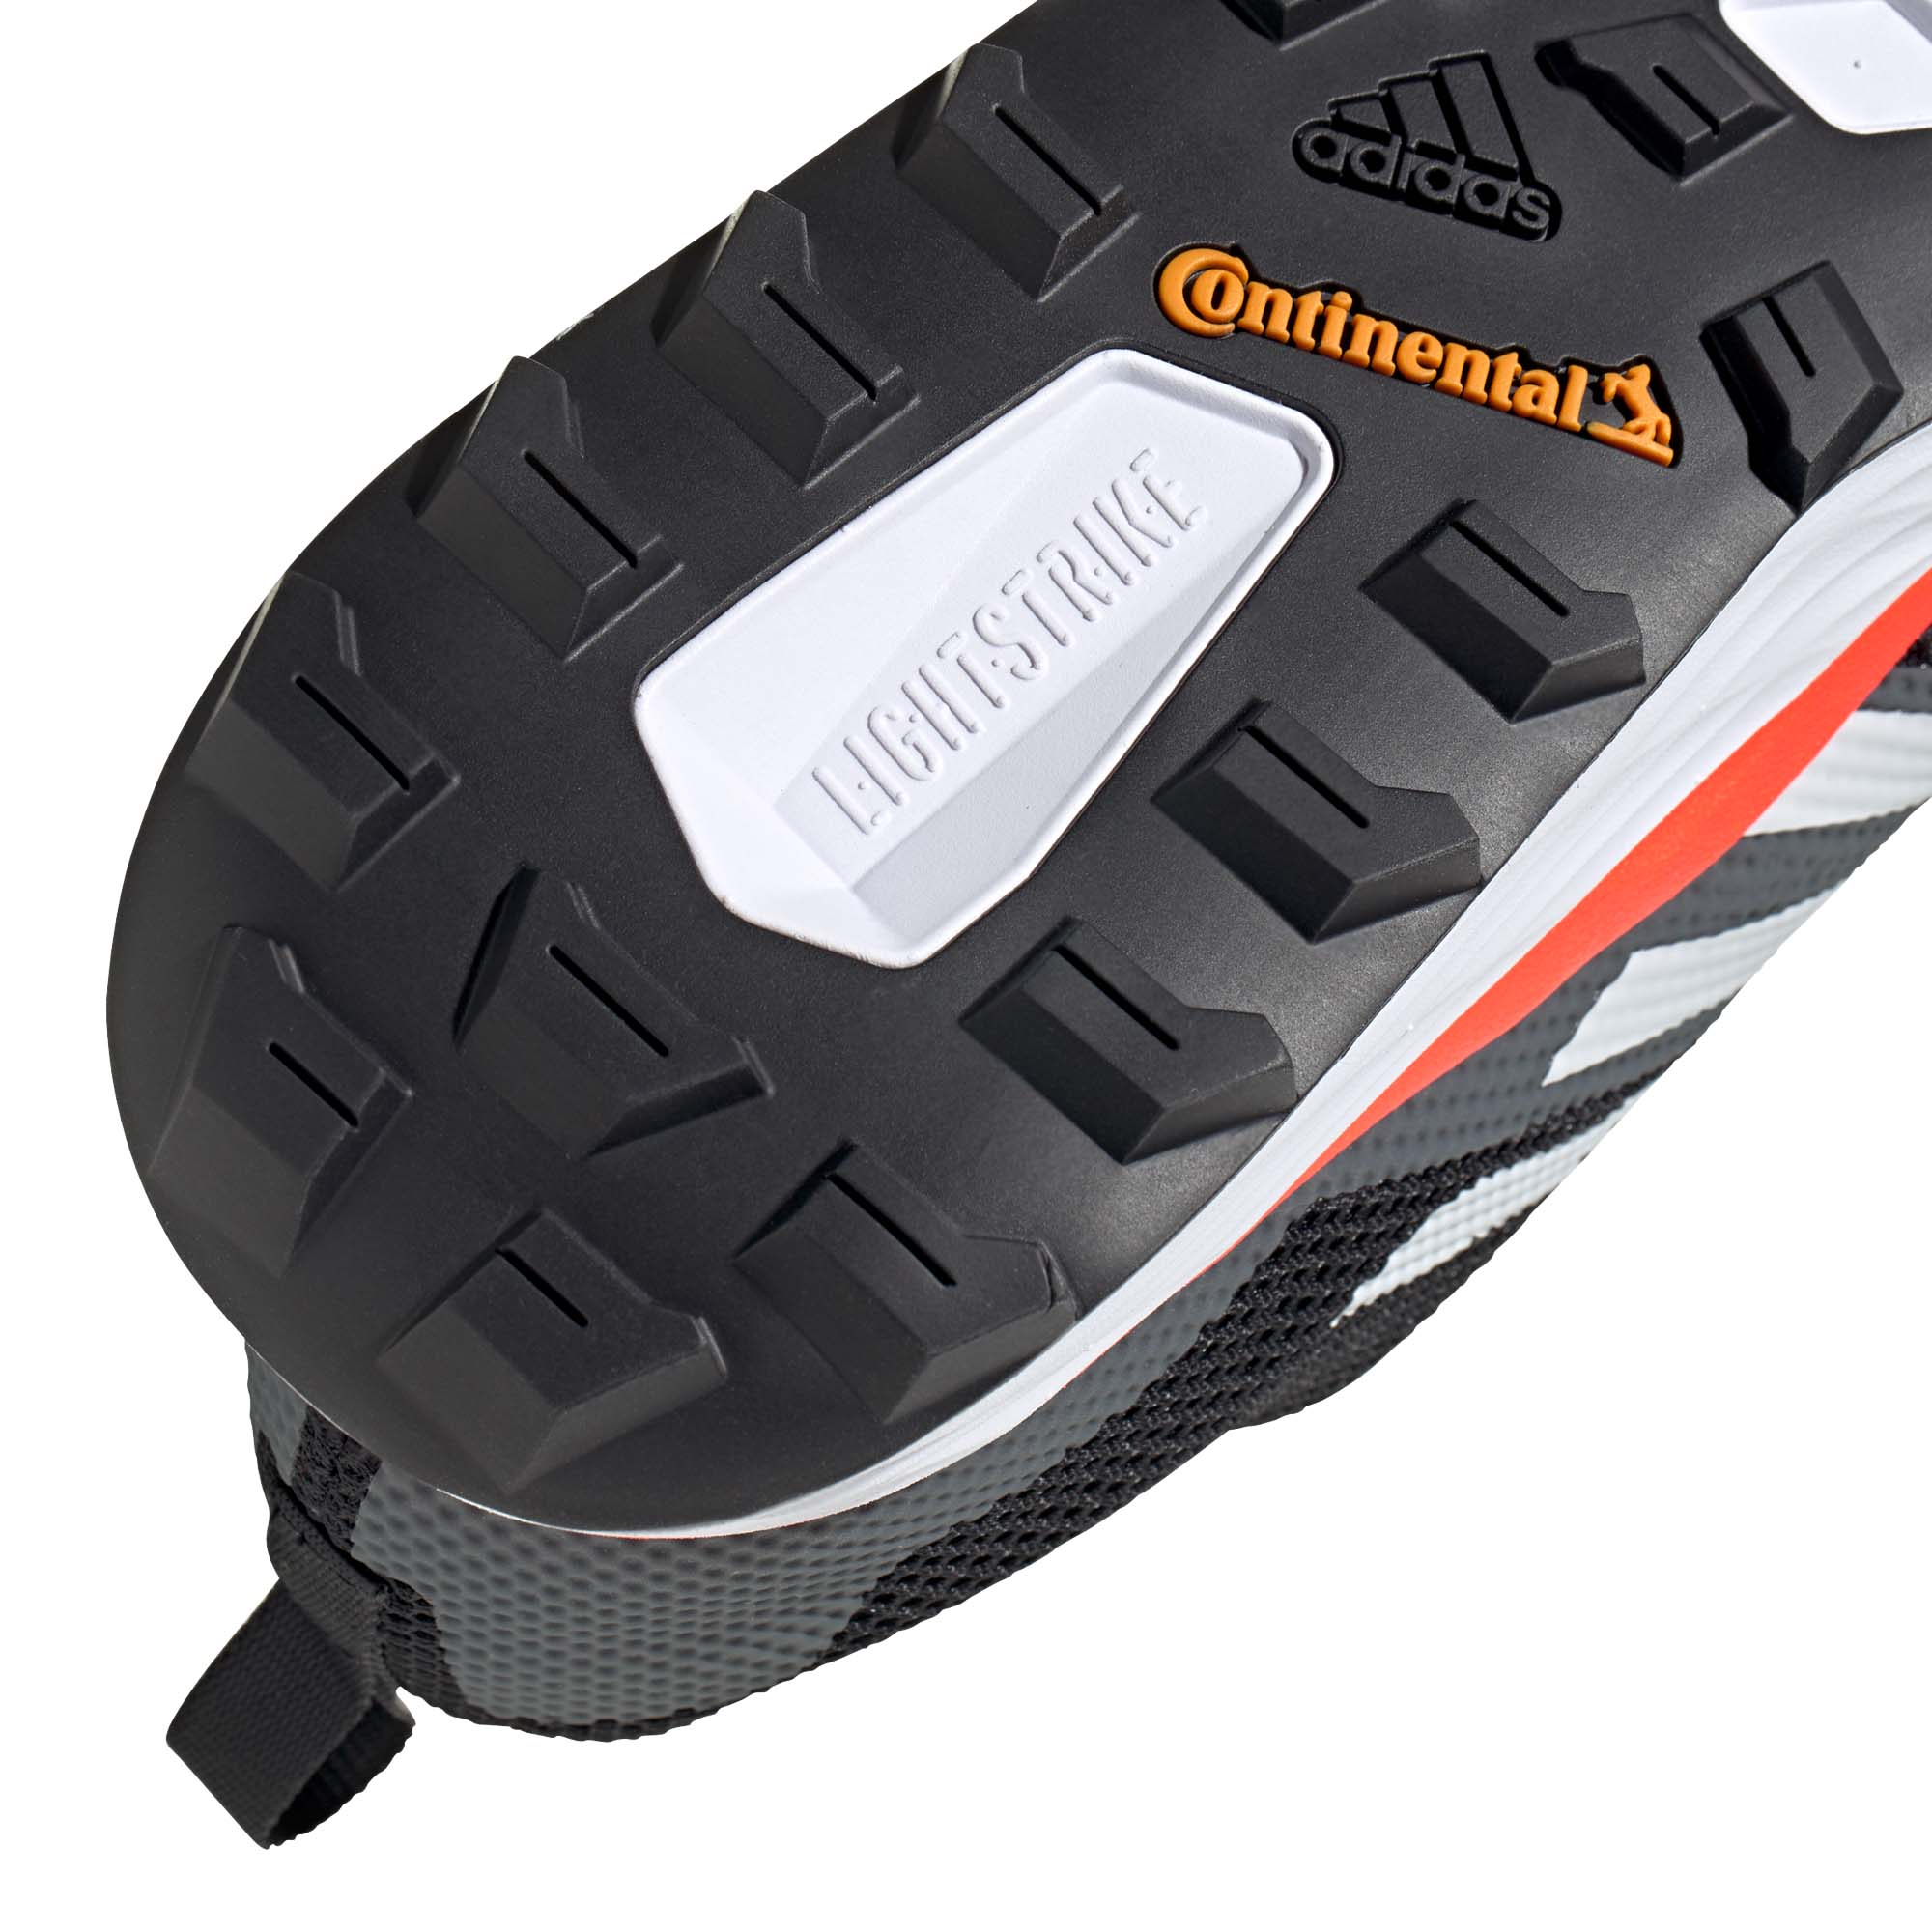 miniatura 10 - ADIDAS Terrex Due Da Uomo Scarpa Trail Running Scarpe da ginnastica nero/bianco/rosso